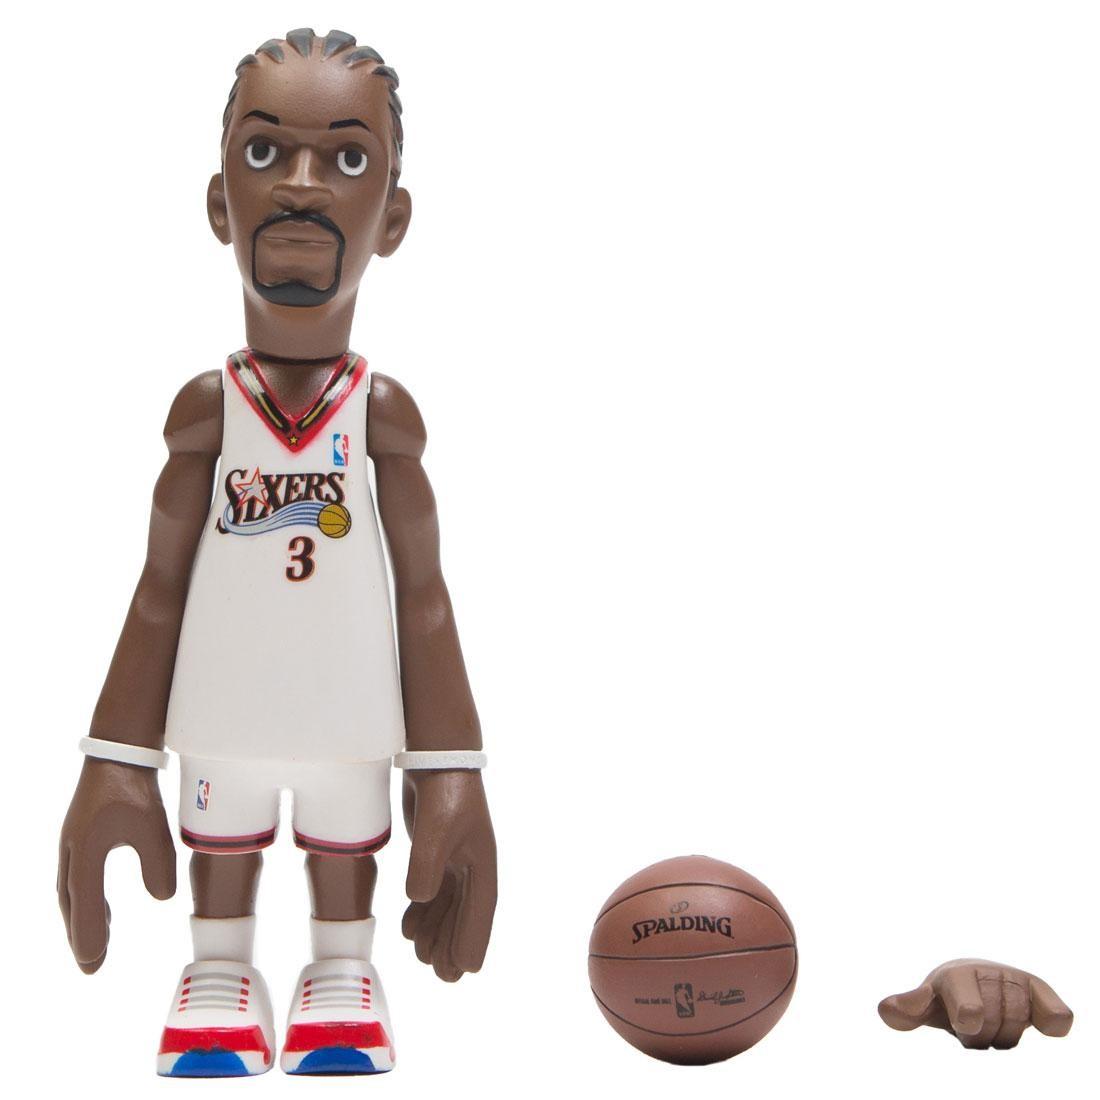 MINDstyle x Coolrain NBA Legends Philadelphia 76ers Allen Iverson Figure (white)